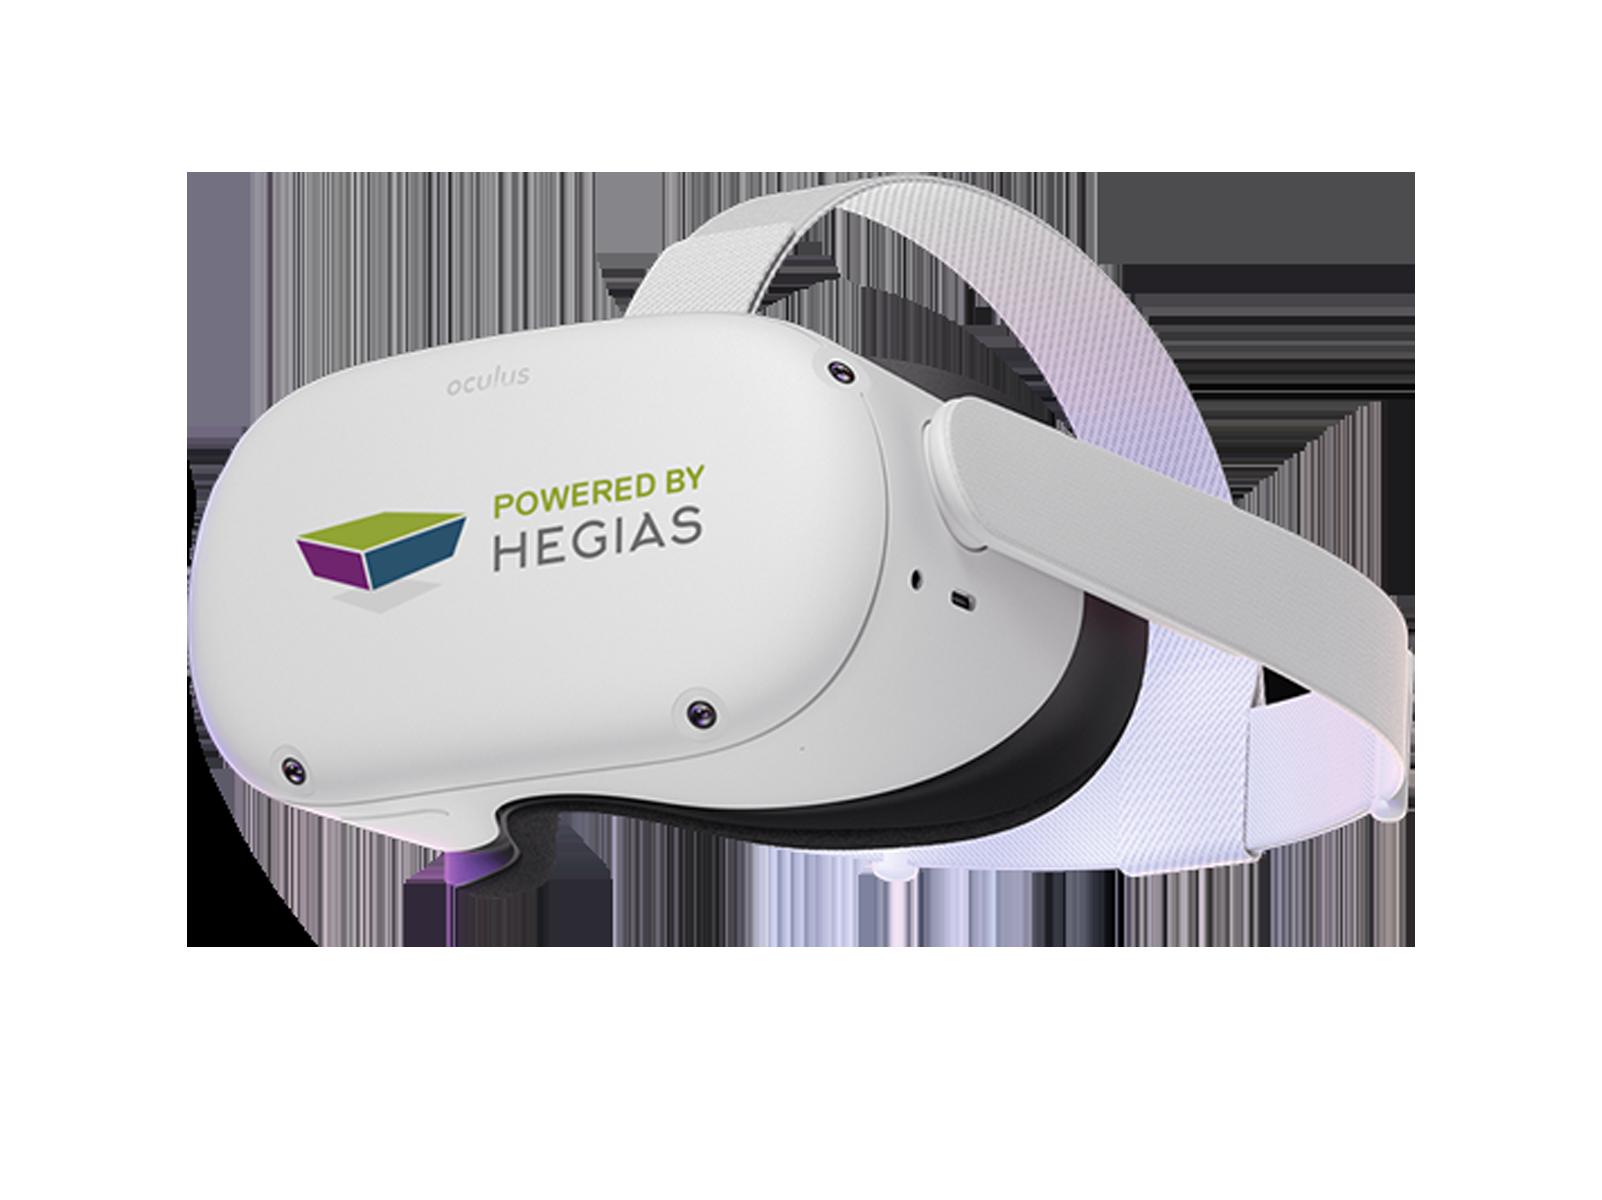 oculus vr power by hegias